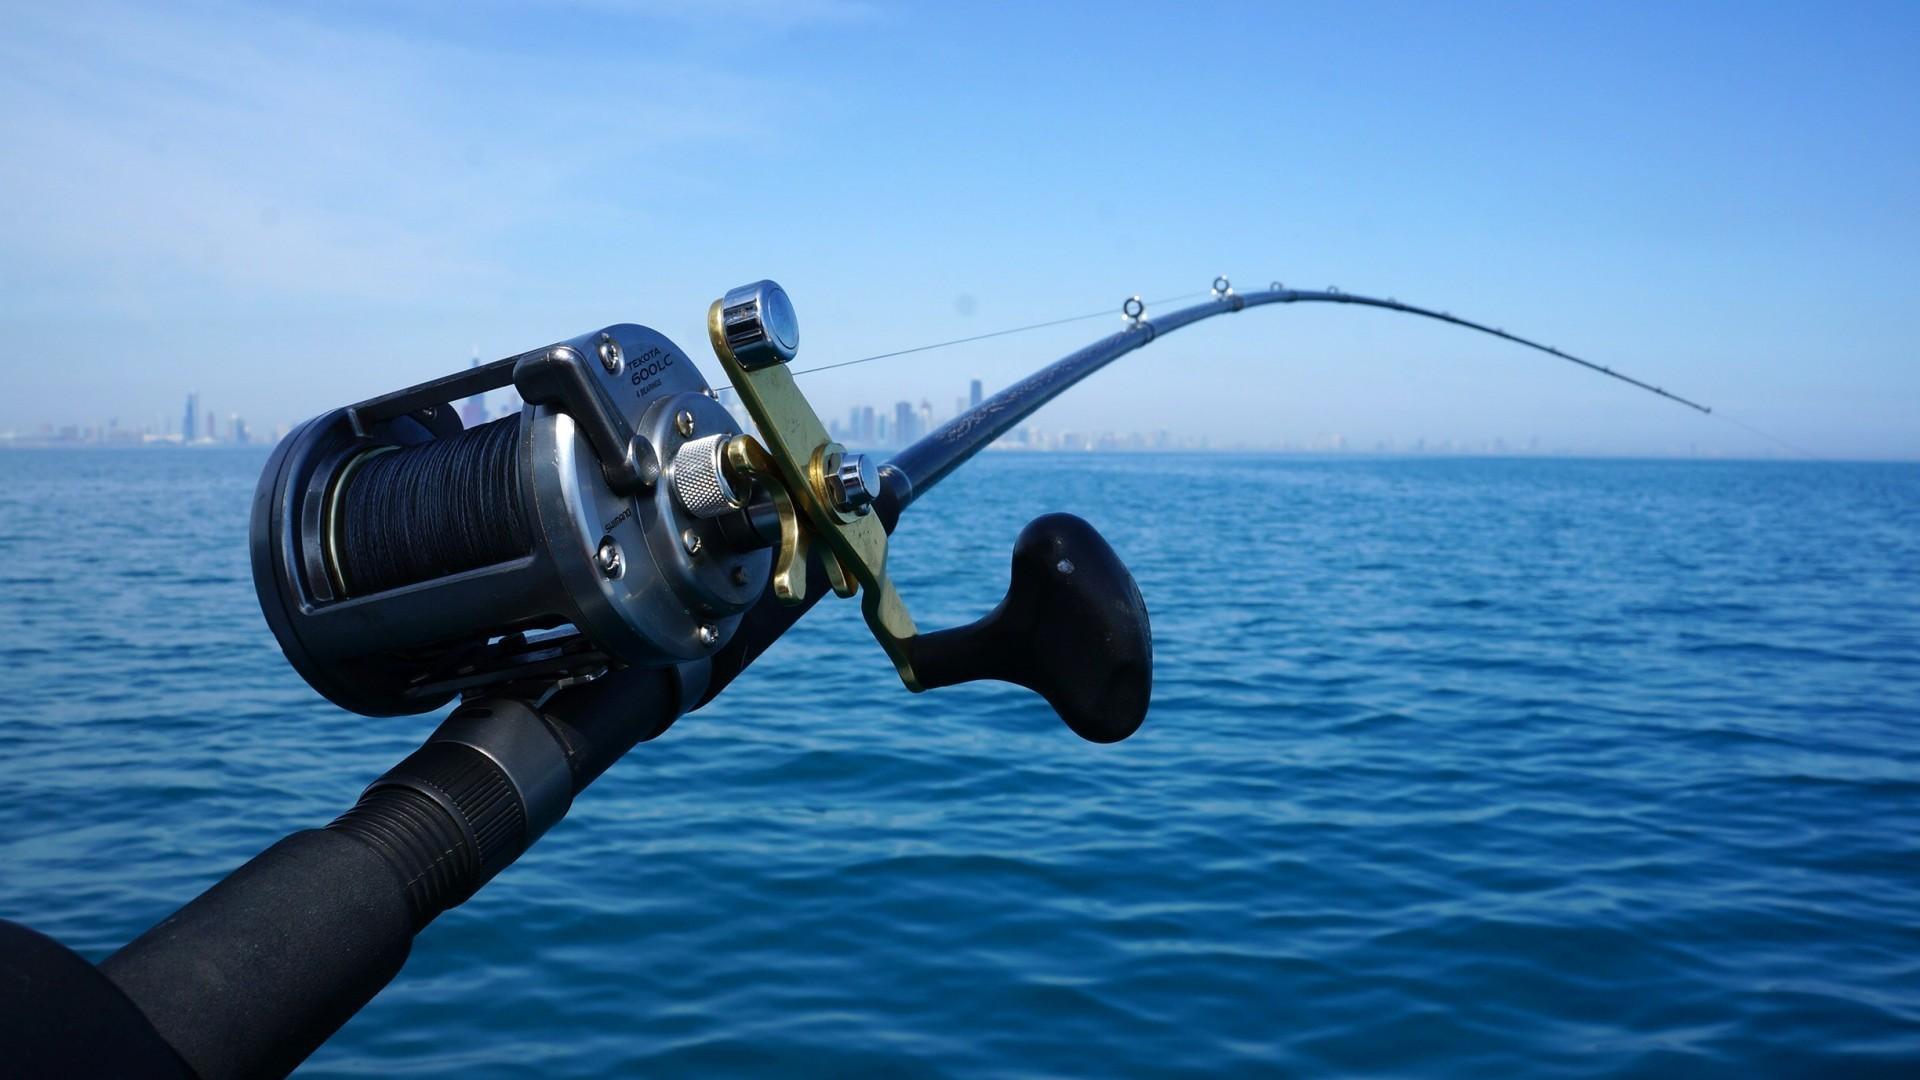 bass fishing wallpaper backgrounds 183��